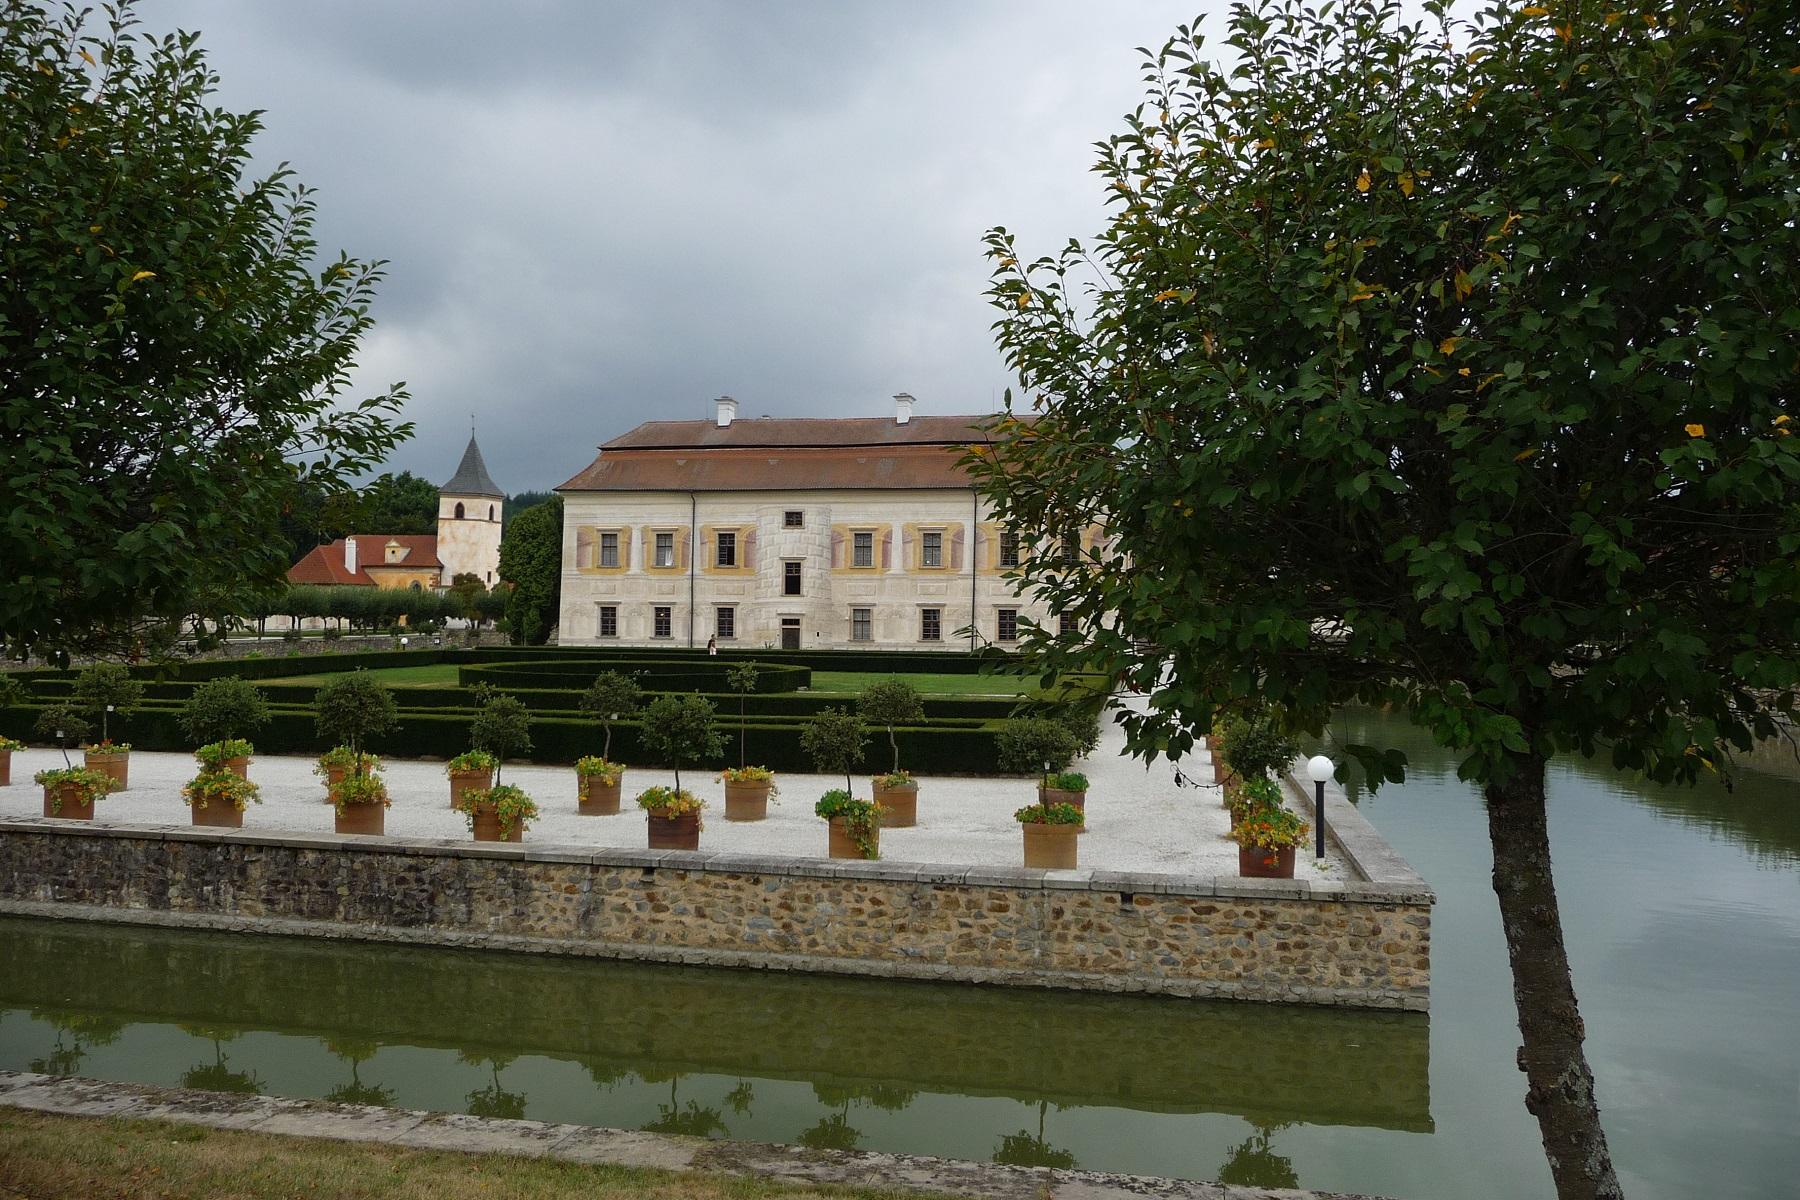 https://www.kempy-chaty.cz/sites/default/files/turistika/zamek_kratochvile_se_zahradou.jpg